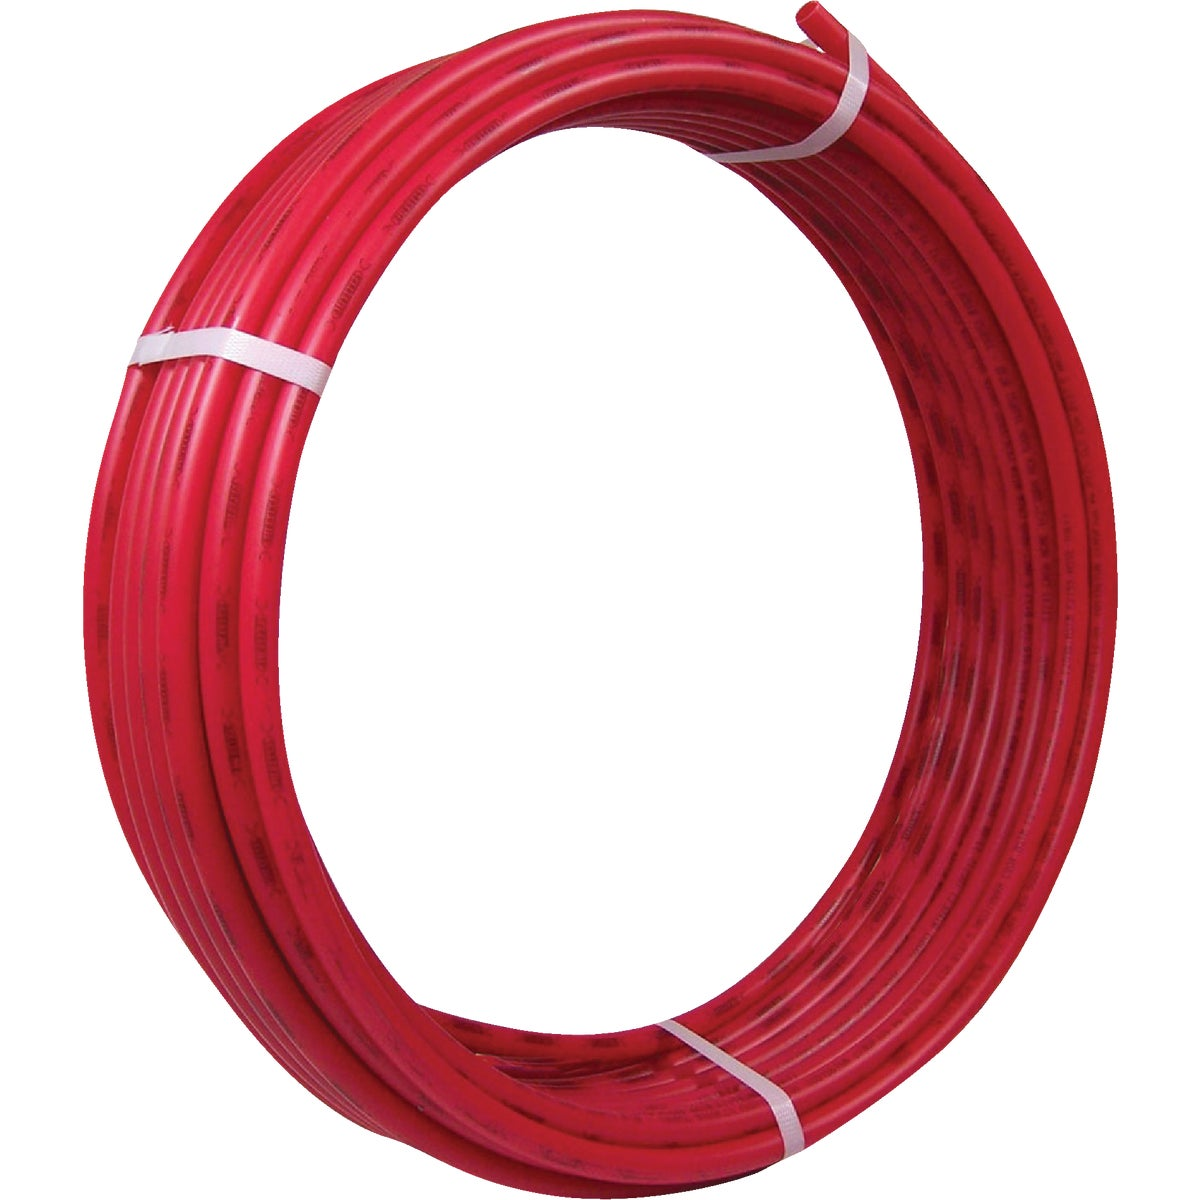 "3/4""X100' RED PEX TUBING"